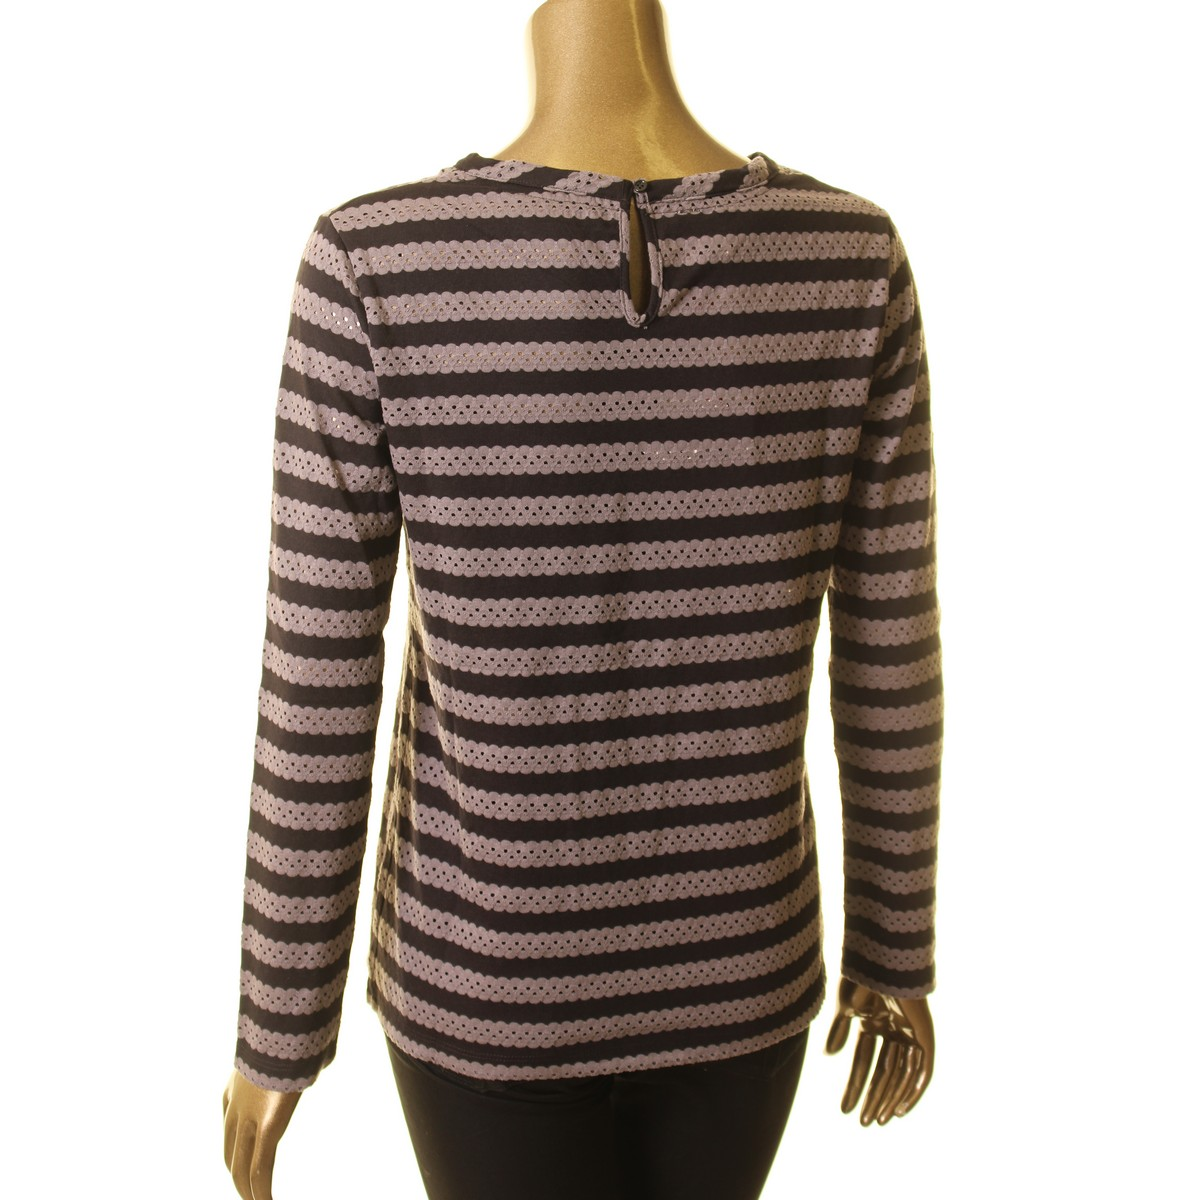 ANNE-KLEIN-NEW-Women-039-s-Eyelet-Striped-Casual-Shirt-Top-TEDO thumbnail 6